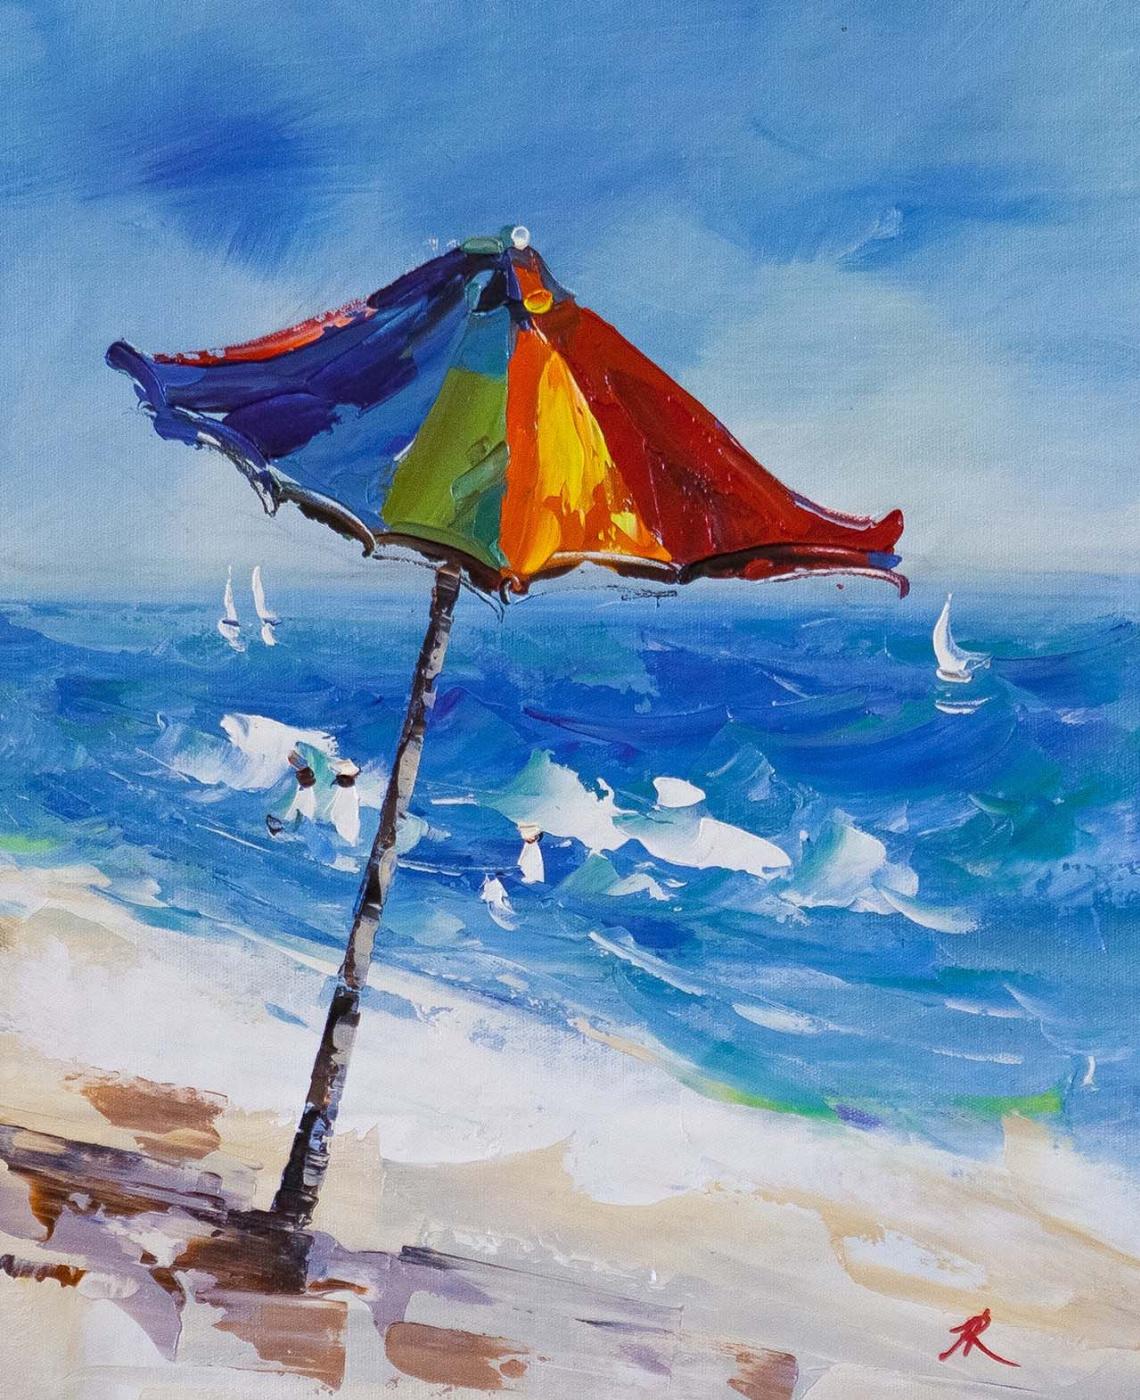 Jose Rodriguez. Beach stories. Umbrella